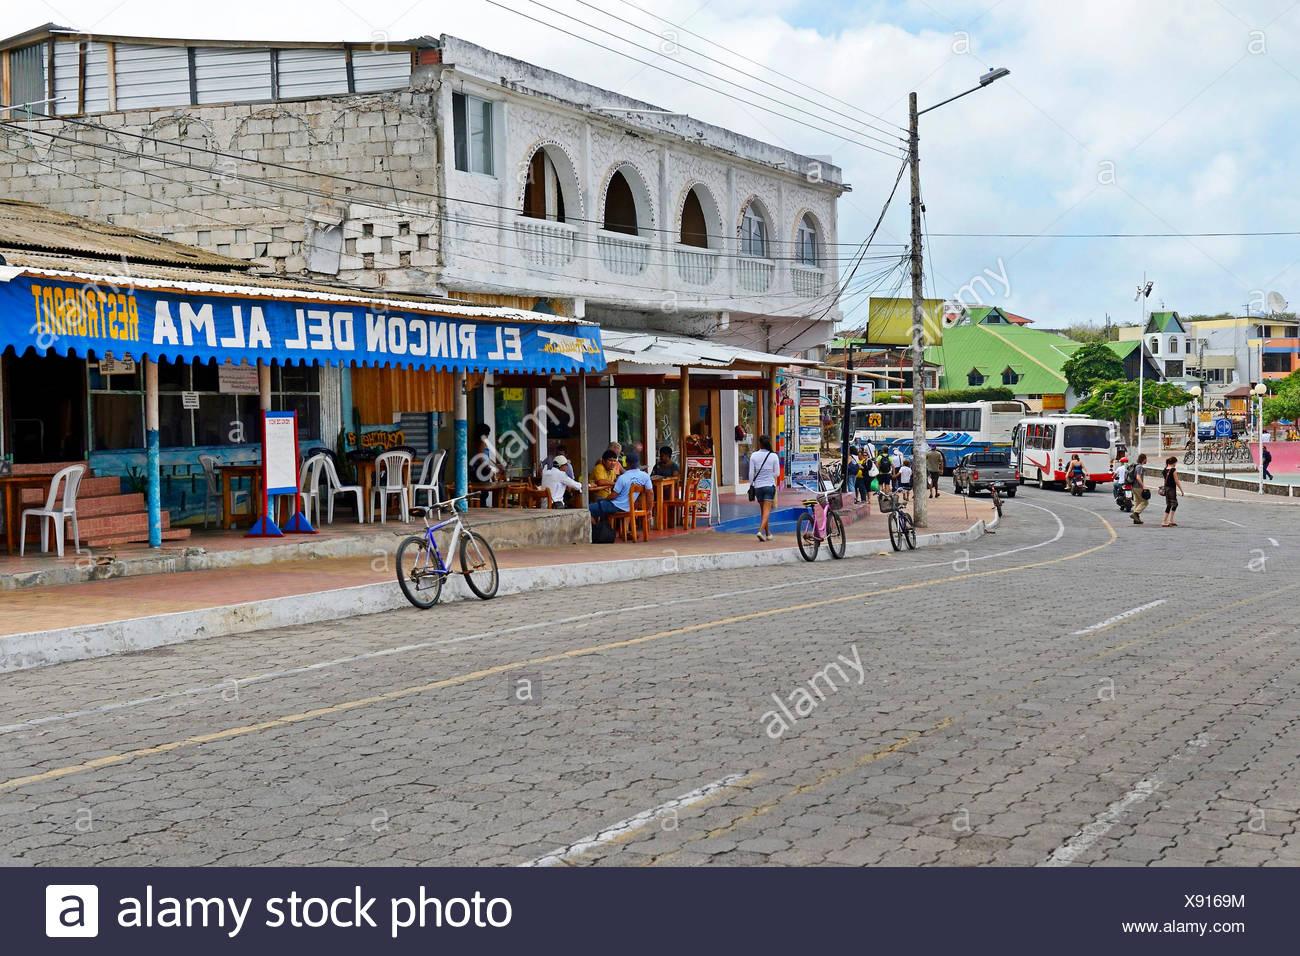 Hauptstrasse von Puerto Ayora mit Geschaeften und Restaurants, Ecuador, Galapagos-Inseln, Santa Cruz, Puerto Ayora | stores and  - Stock Image